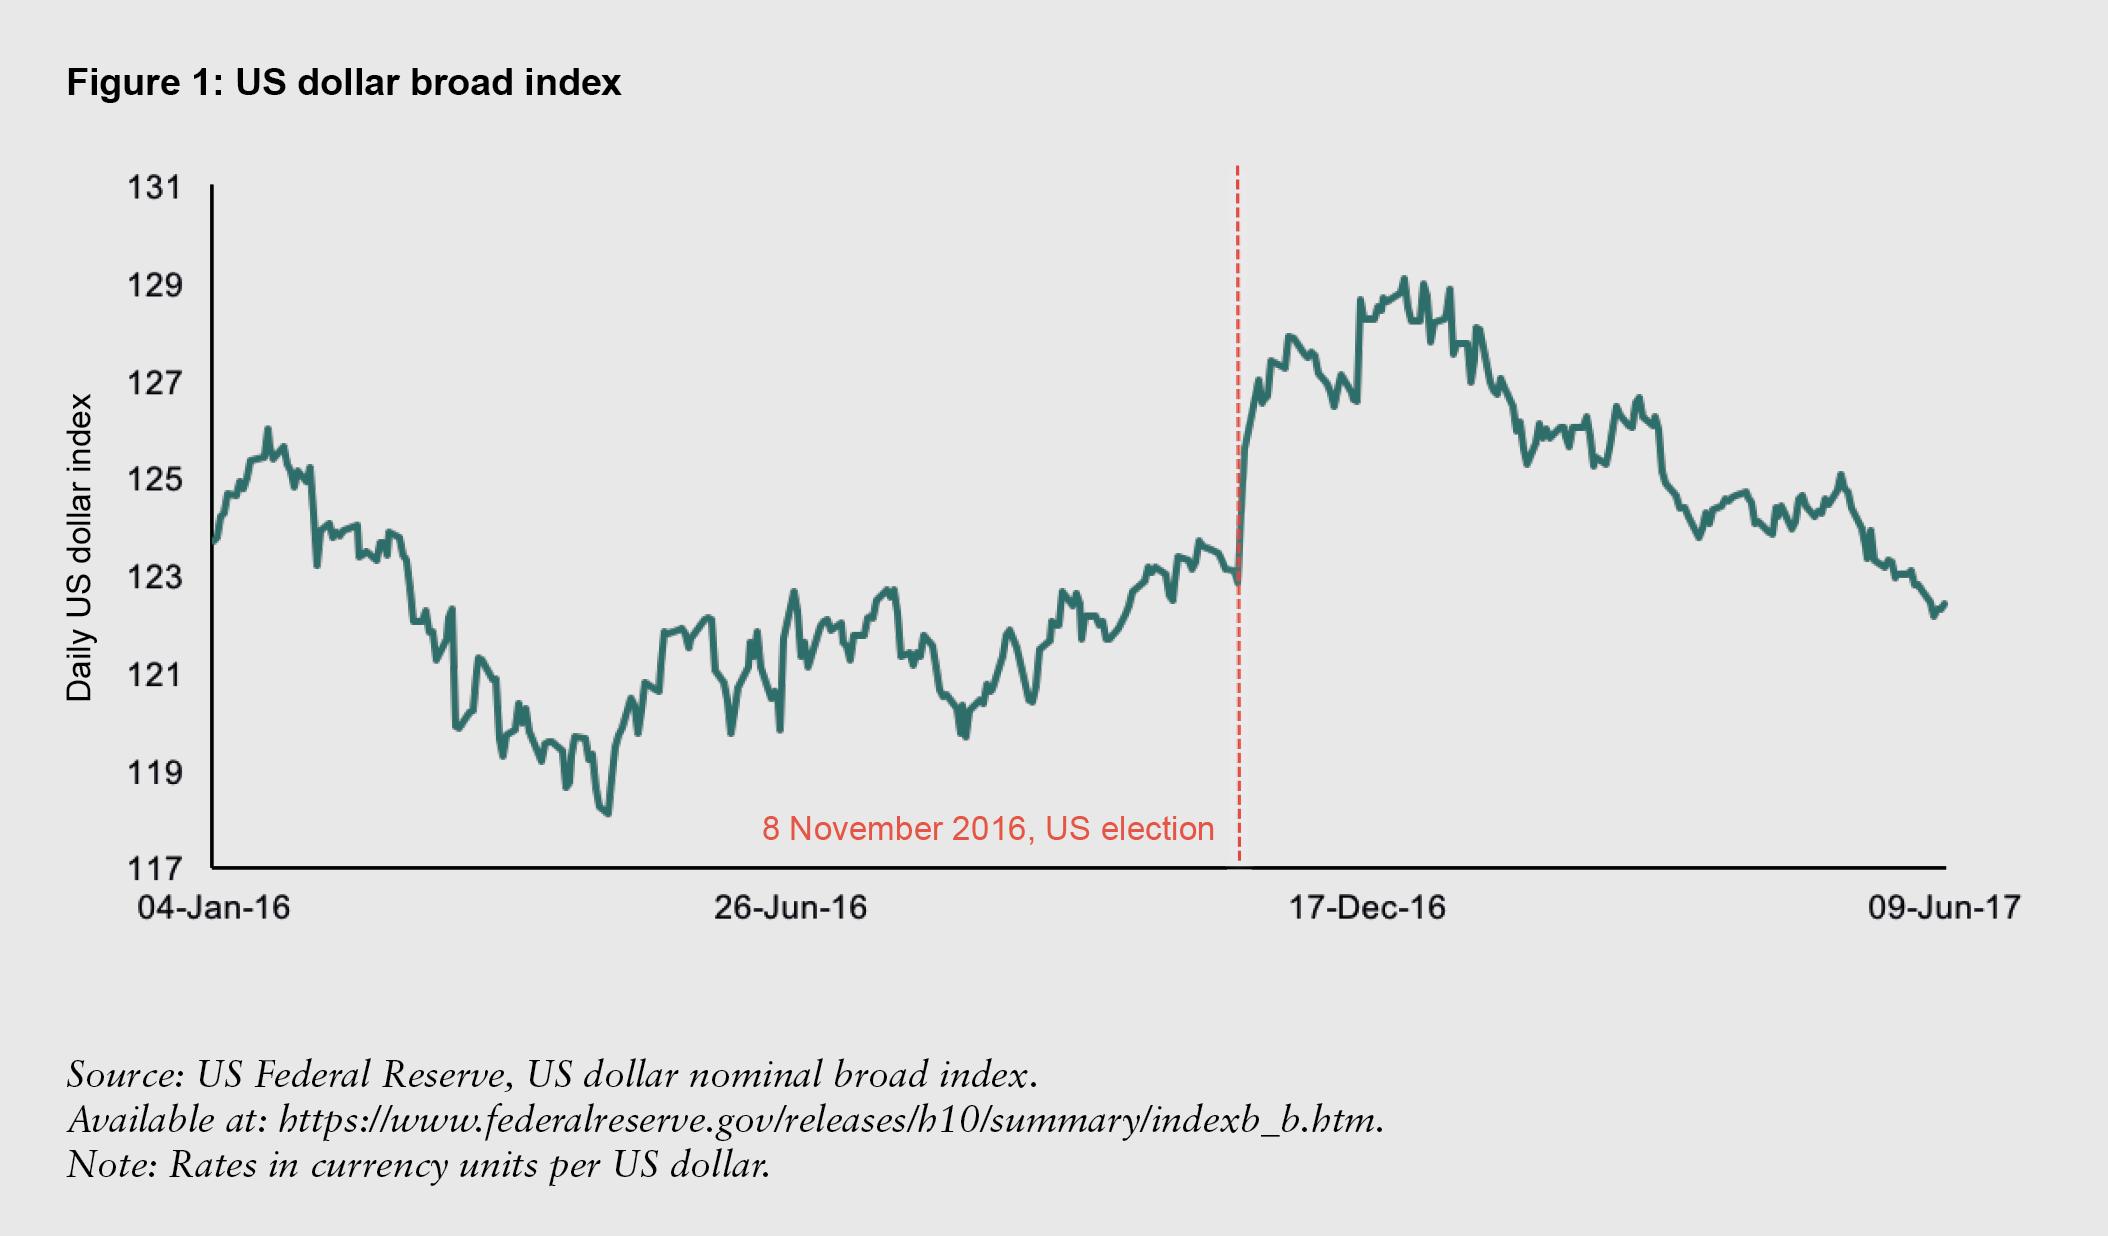 Figure 1: US dollar broad index